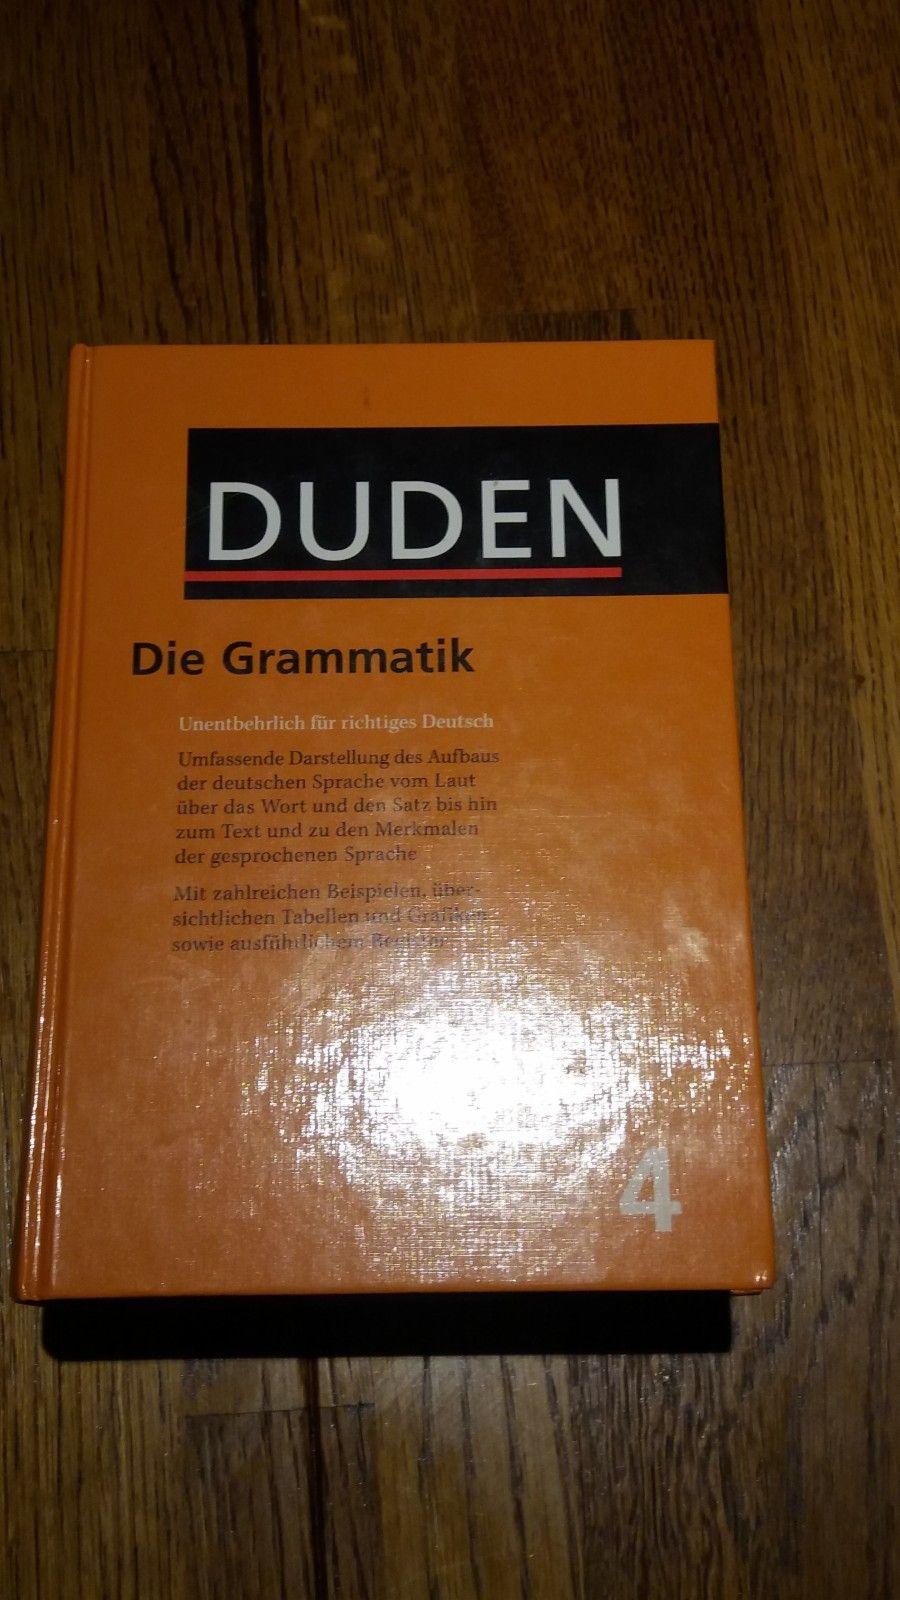 Duden, Langescheidt, Tysk Ordbok, grammatik, Stilistik | FINN no